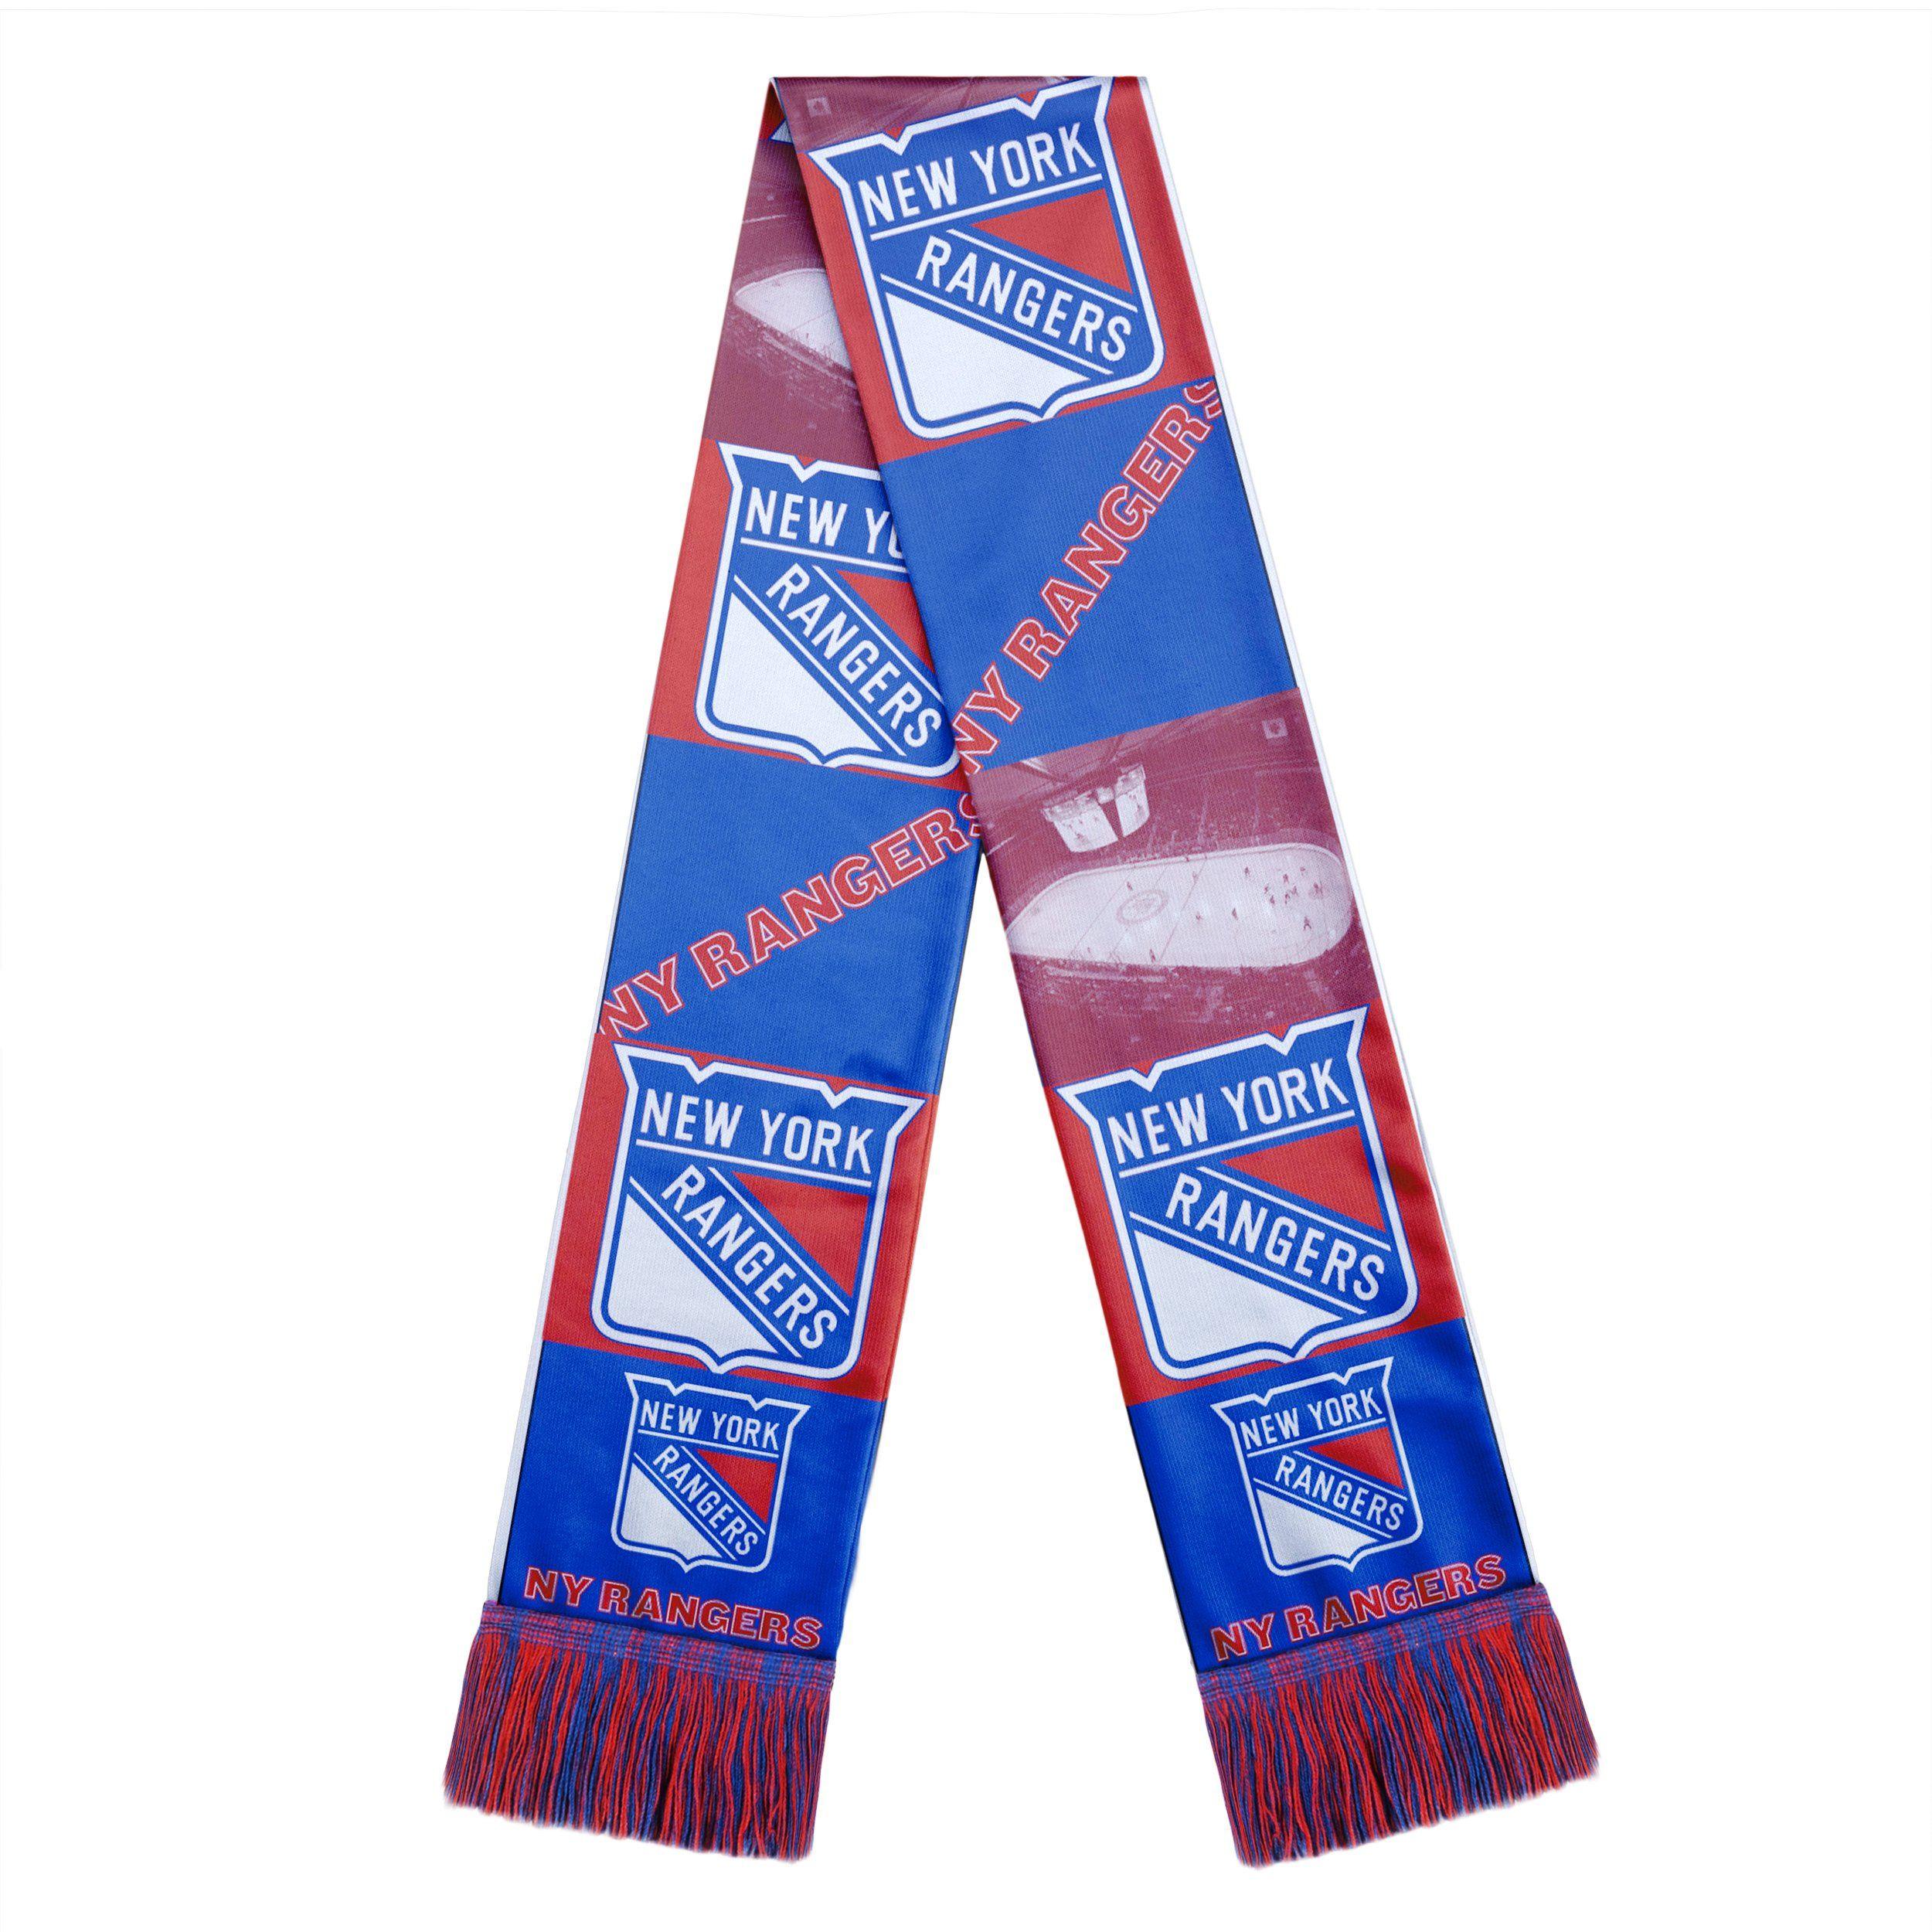 New York Rangers Scarf Printed Bar Design In 2020 New York Rangers Ranger New York